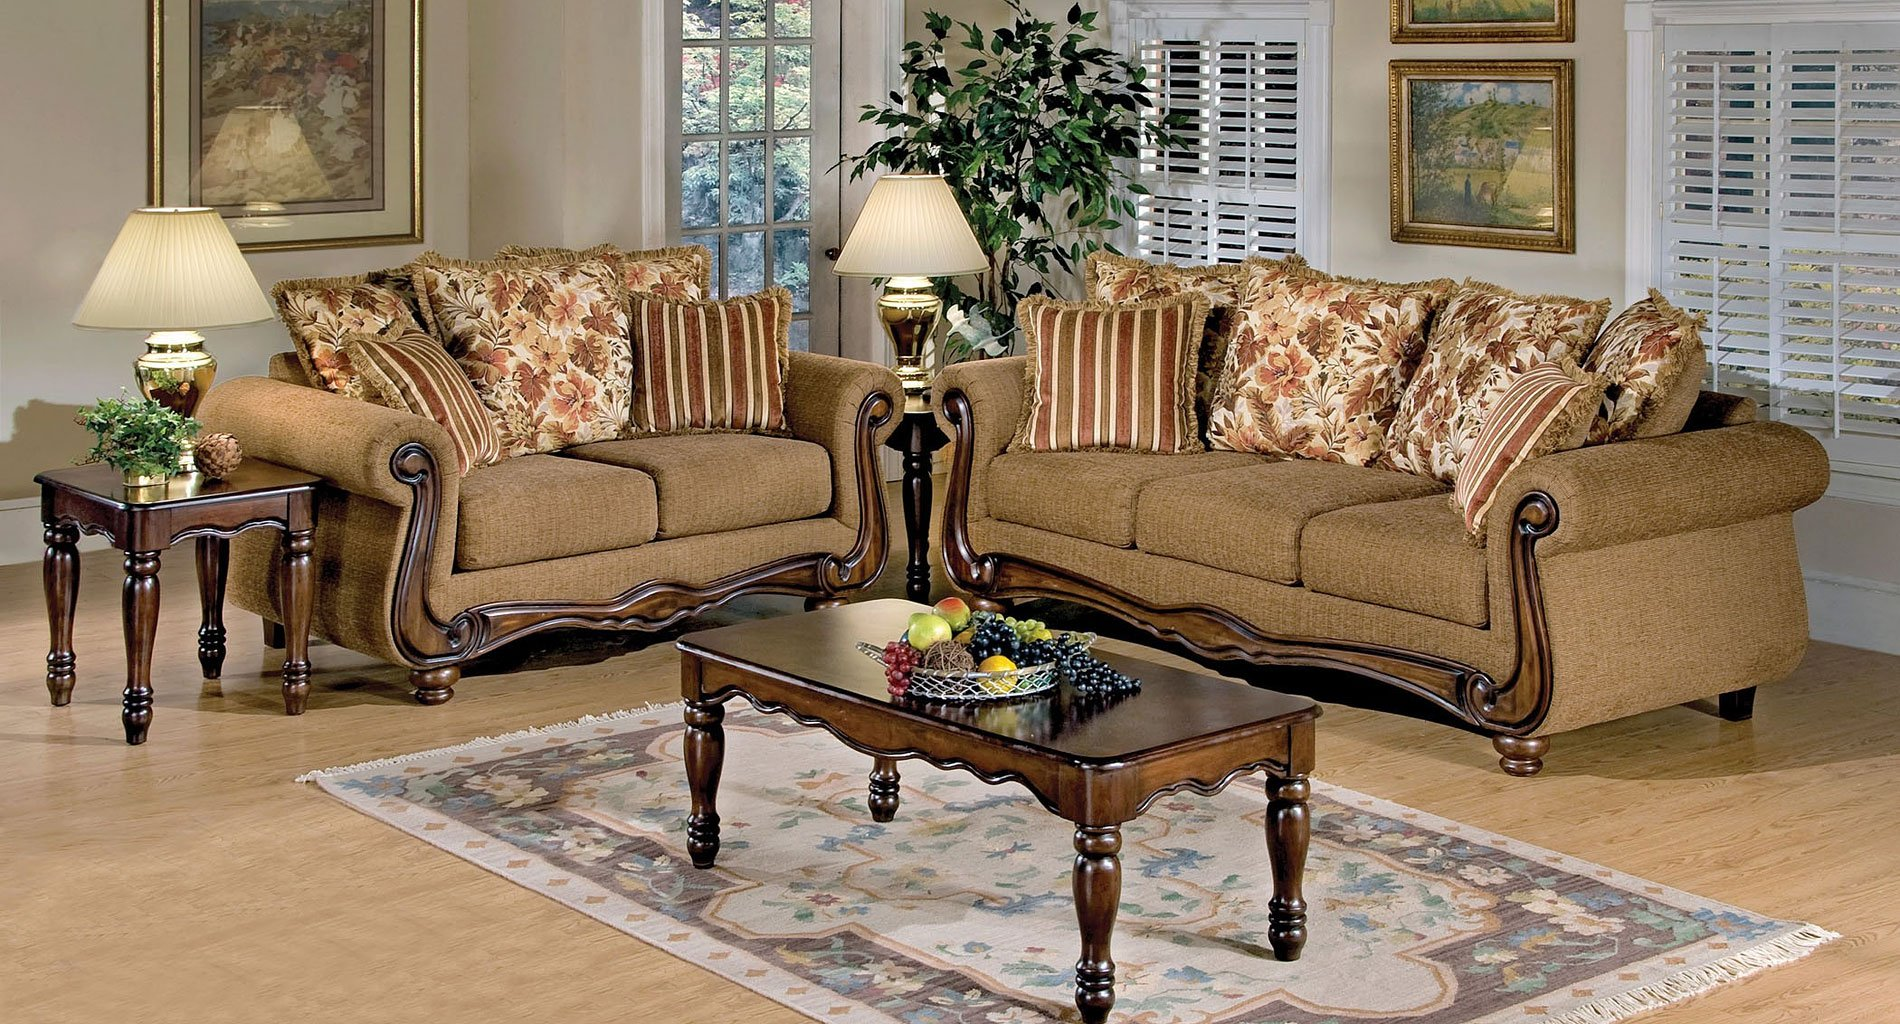 Olysseus Living Room Set Brown Floral By Acme Furniture